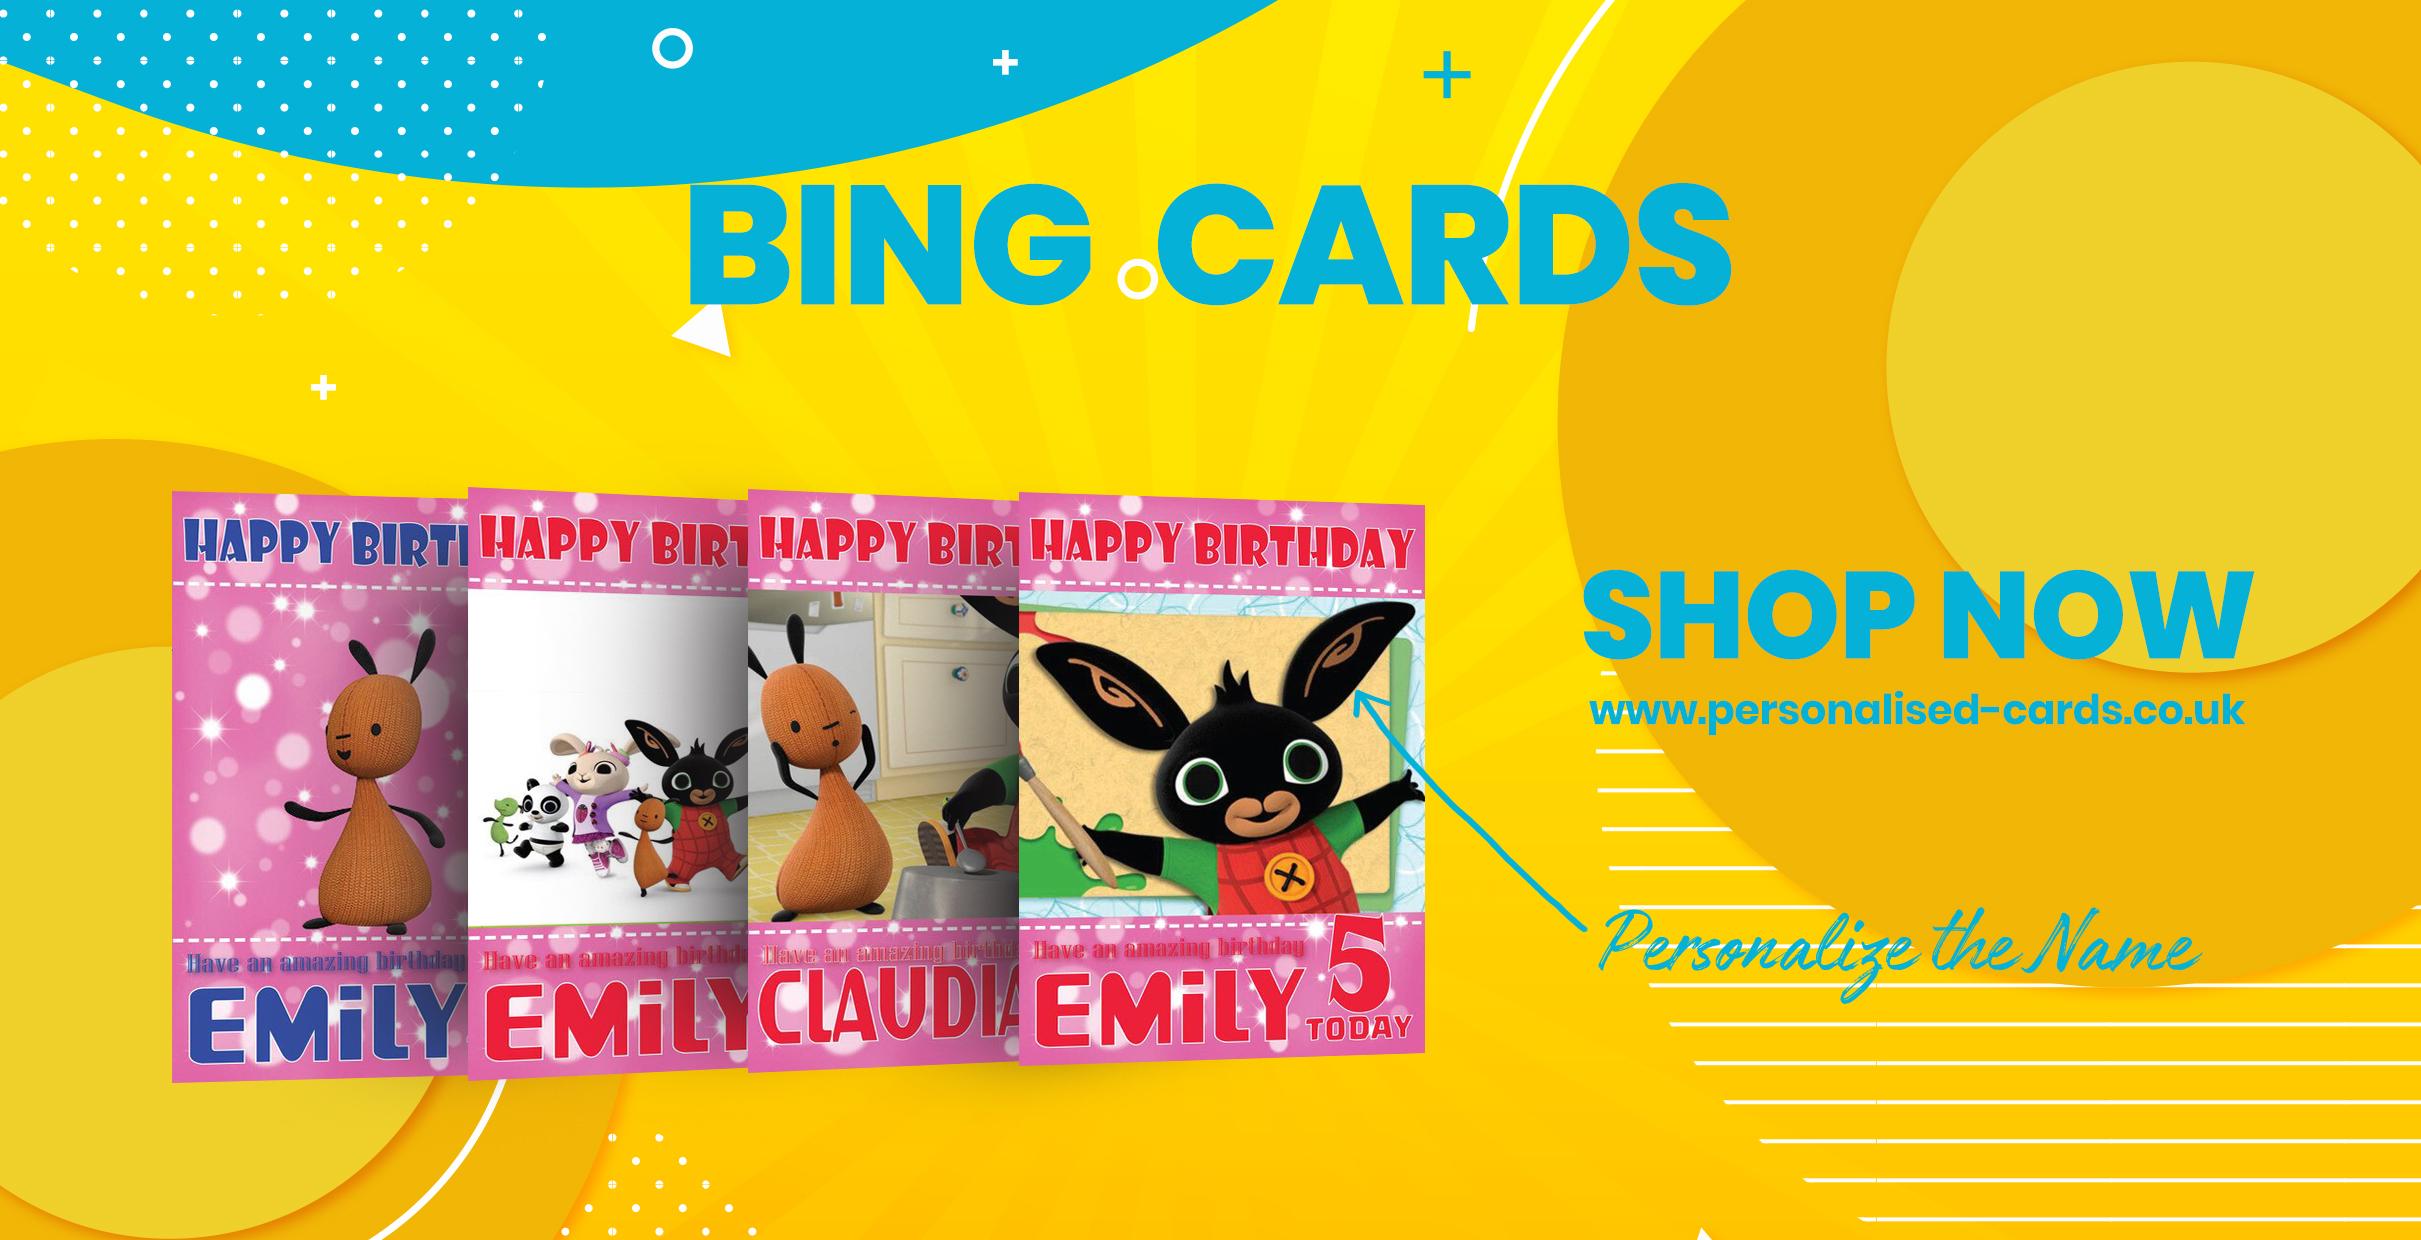 bing-cards.jpg